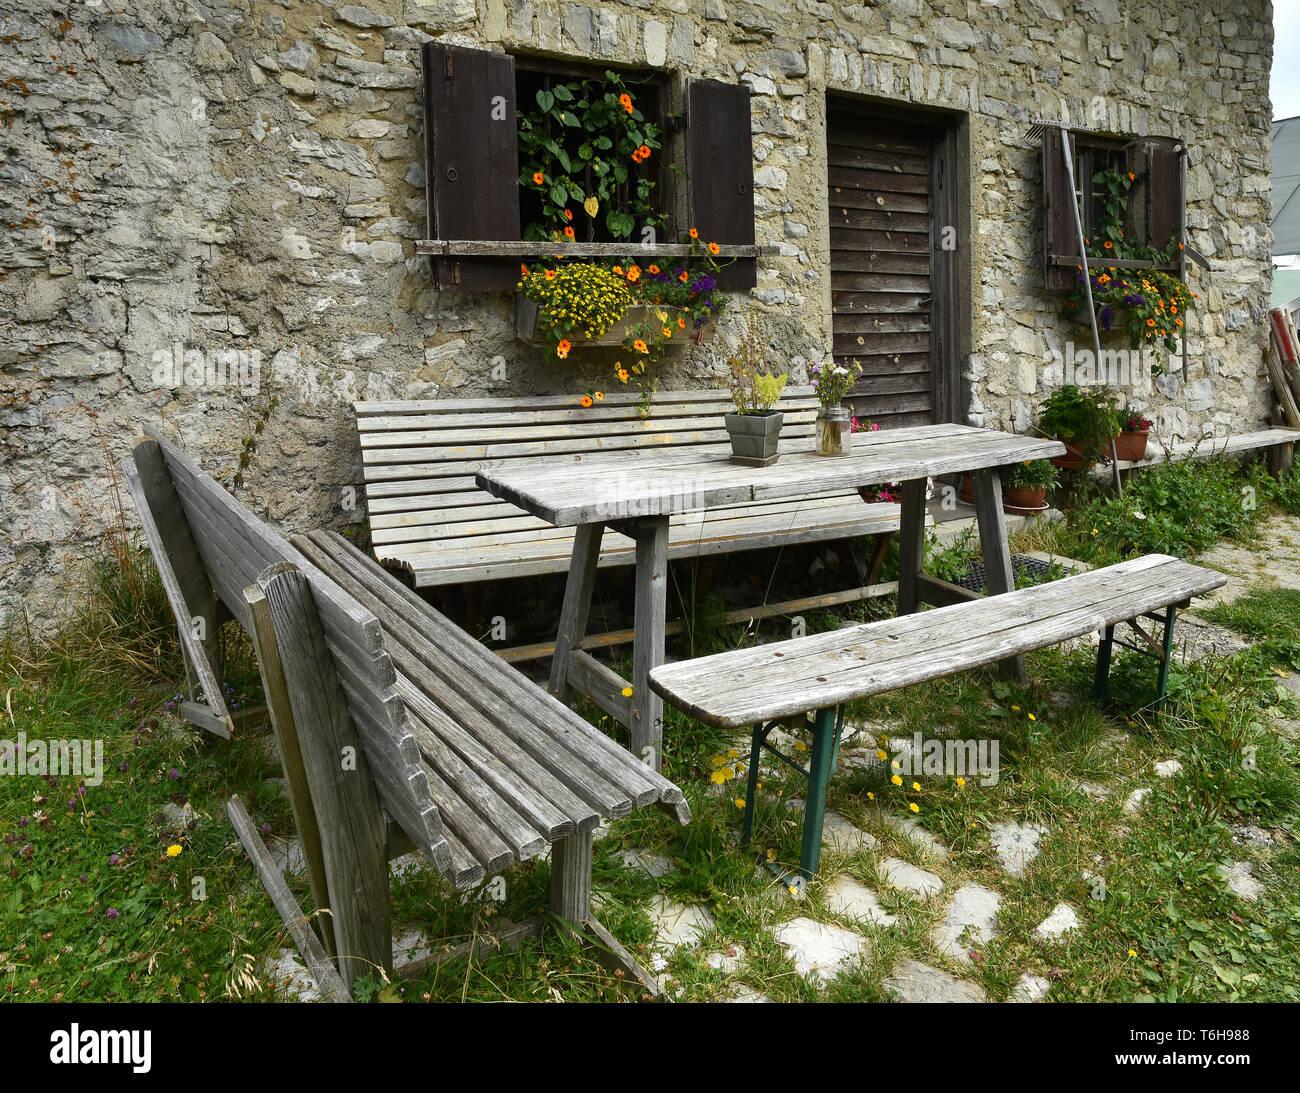 flower decoration, alp, hut - Stock Image